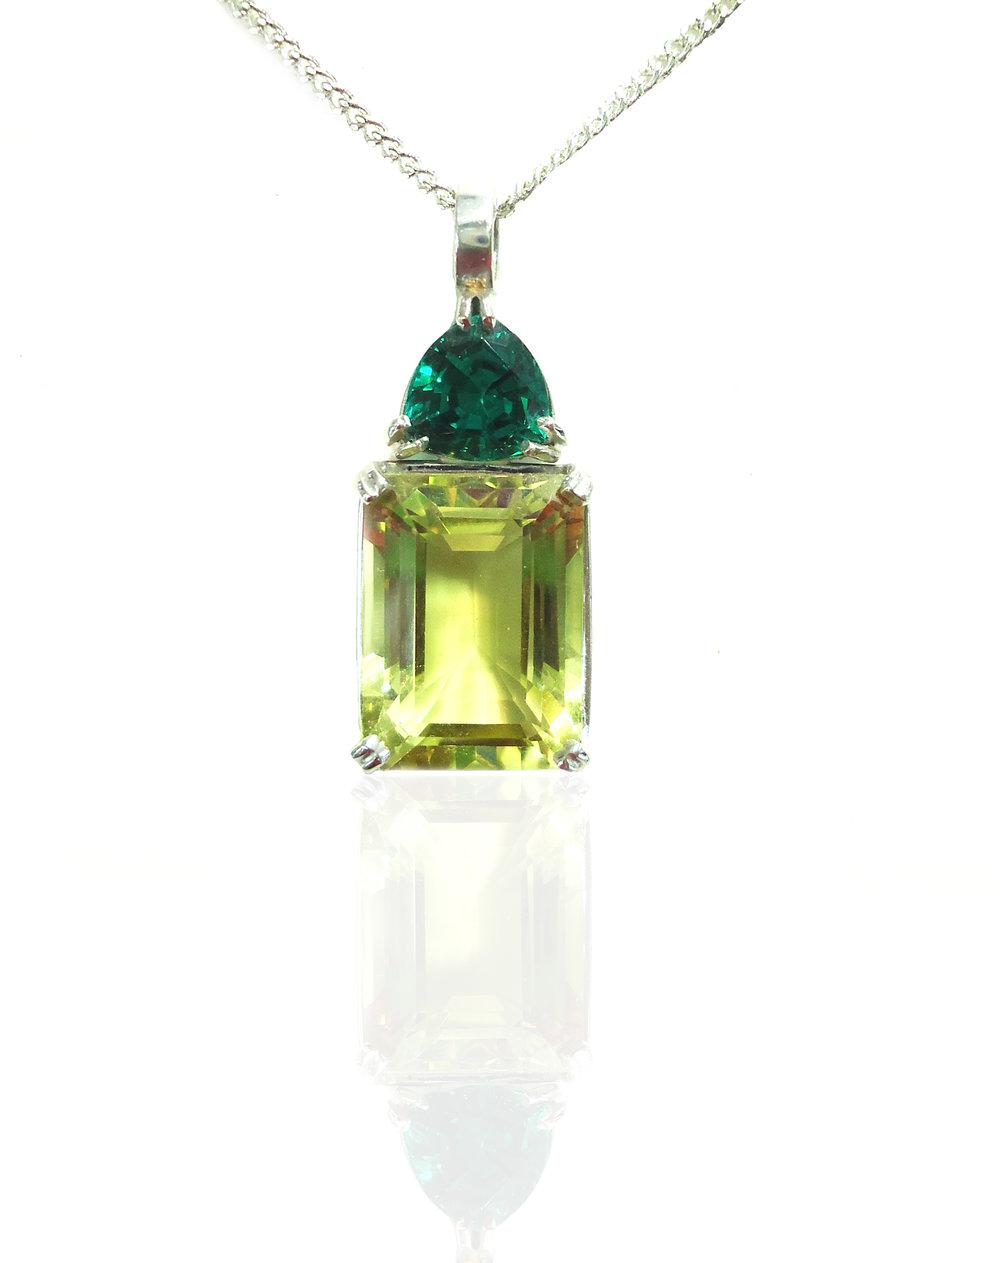 Emerald & Lemon Quartz pendant!